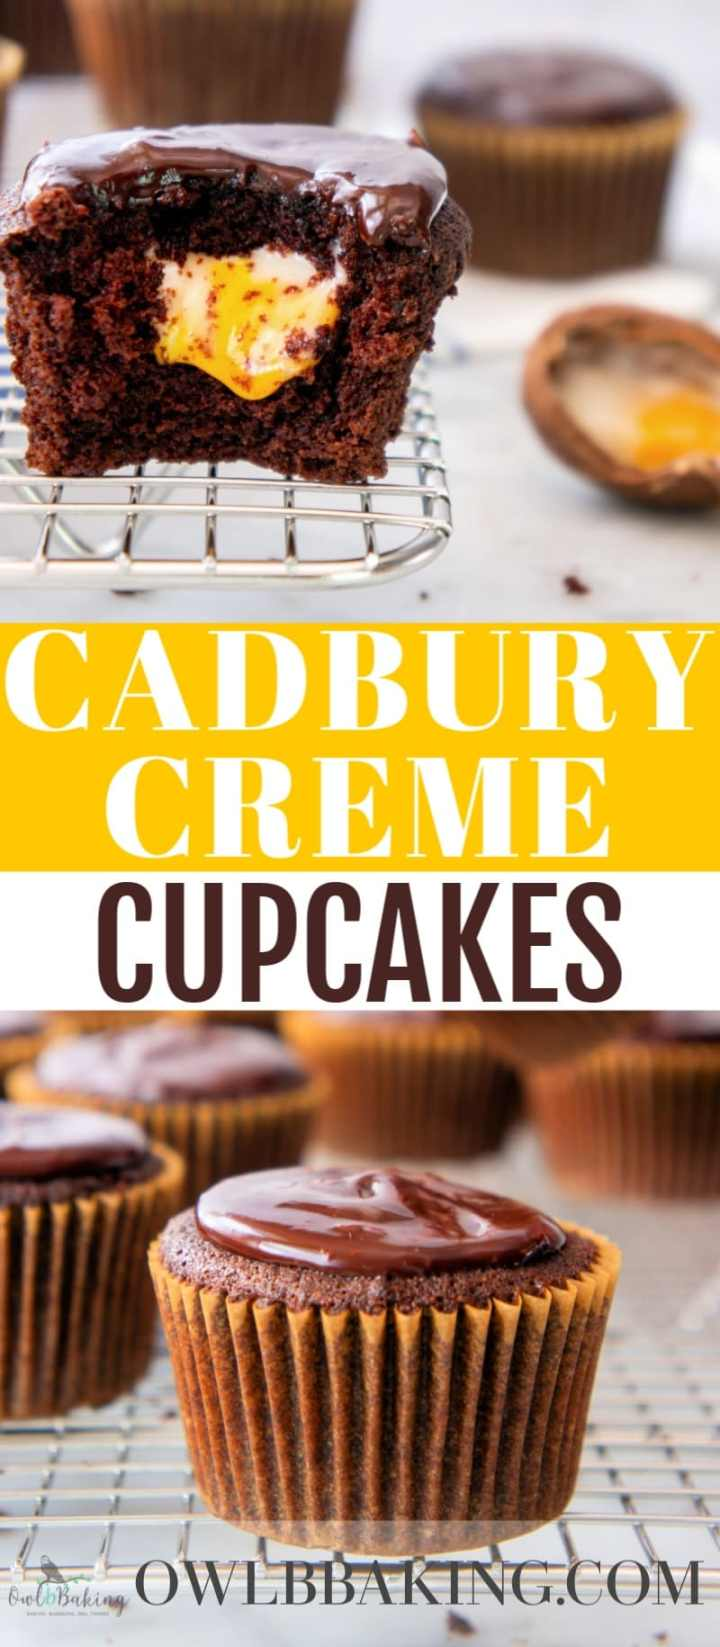 Cadbury Creme Cupcakes